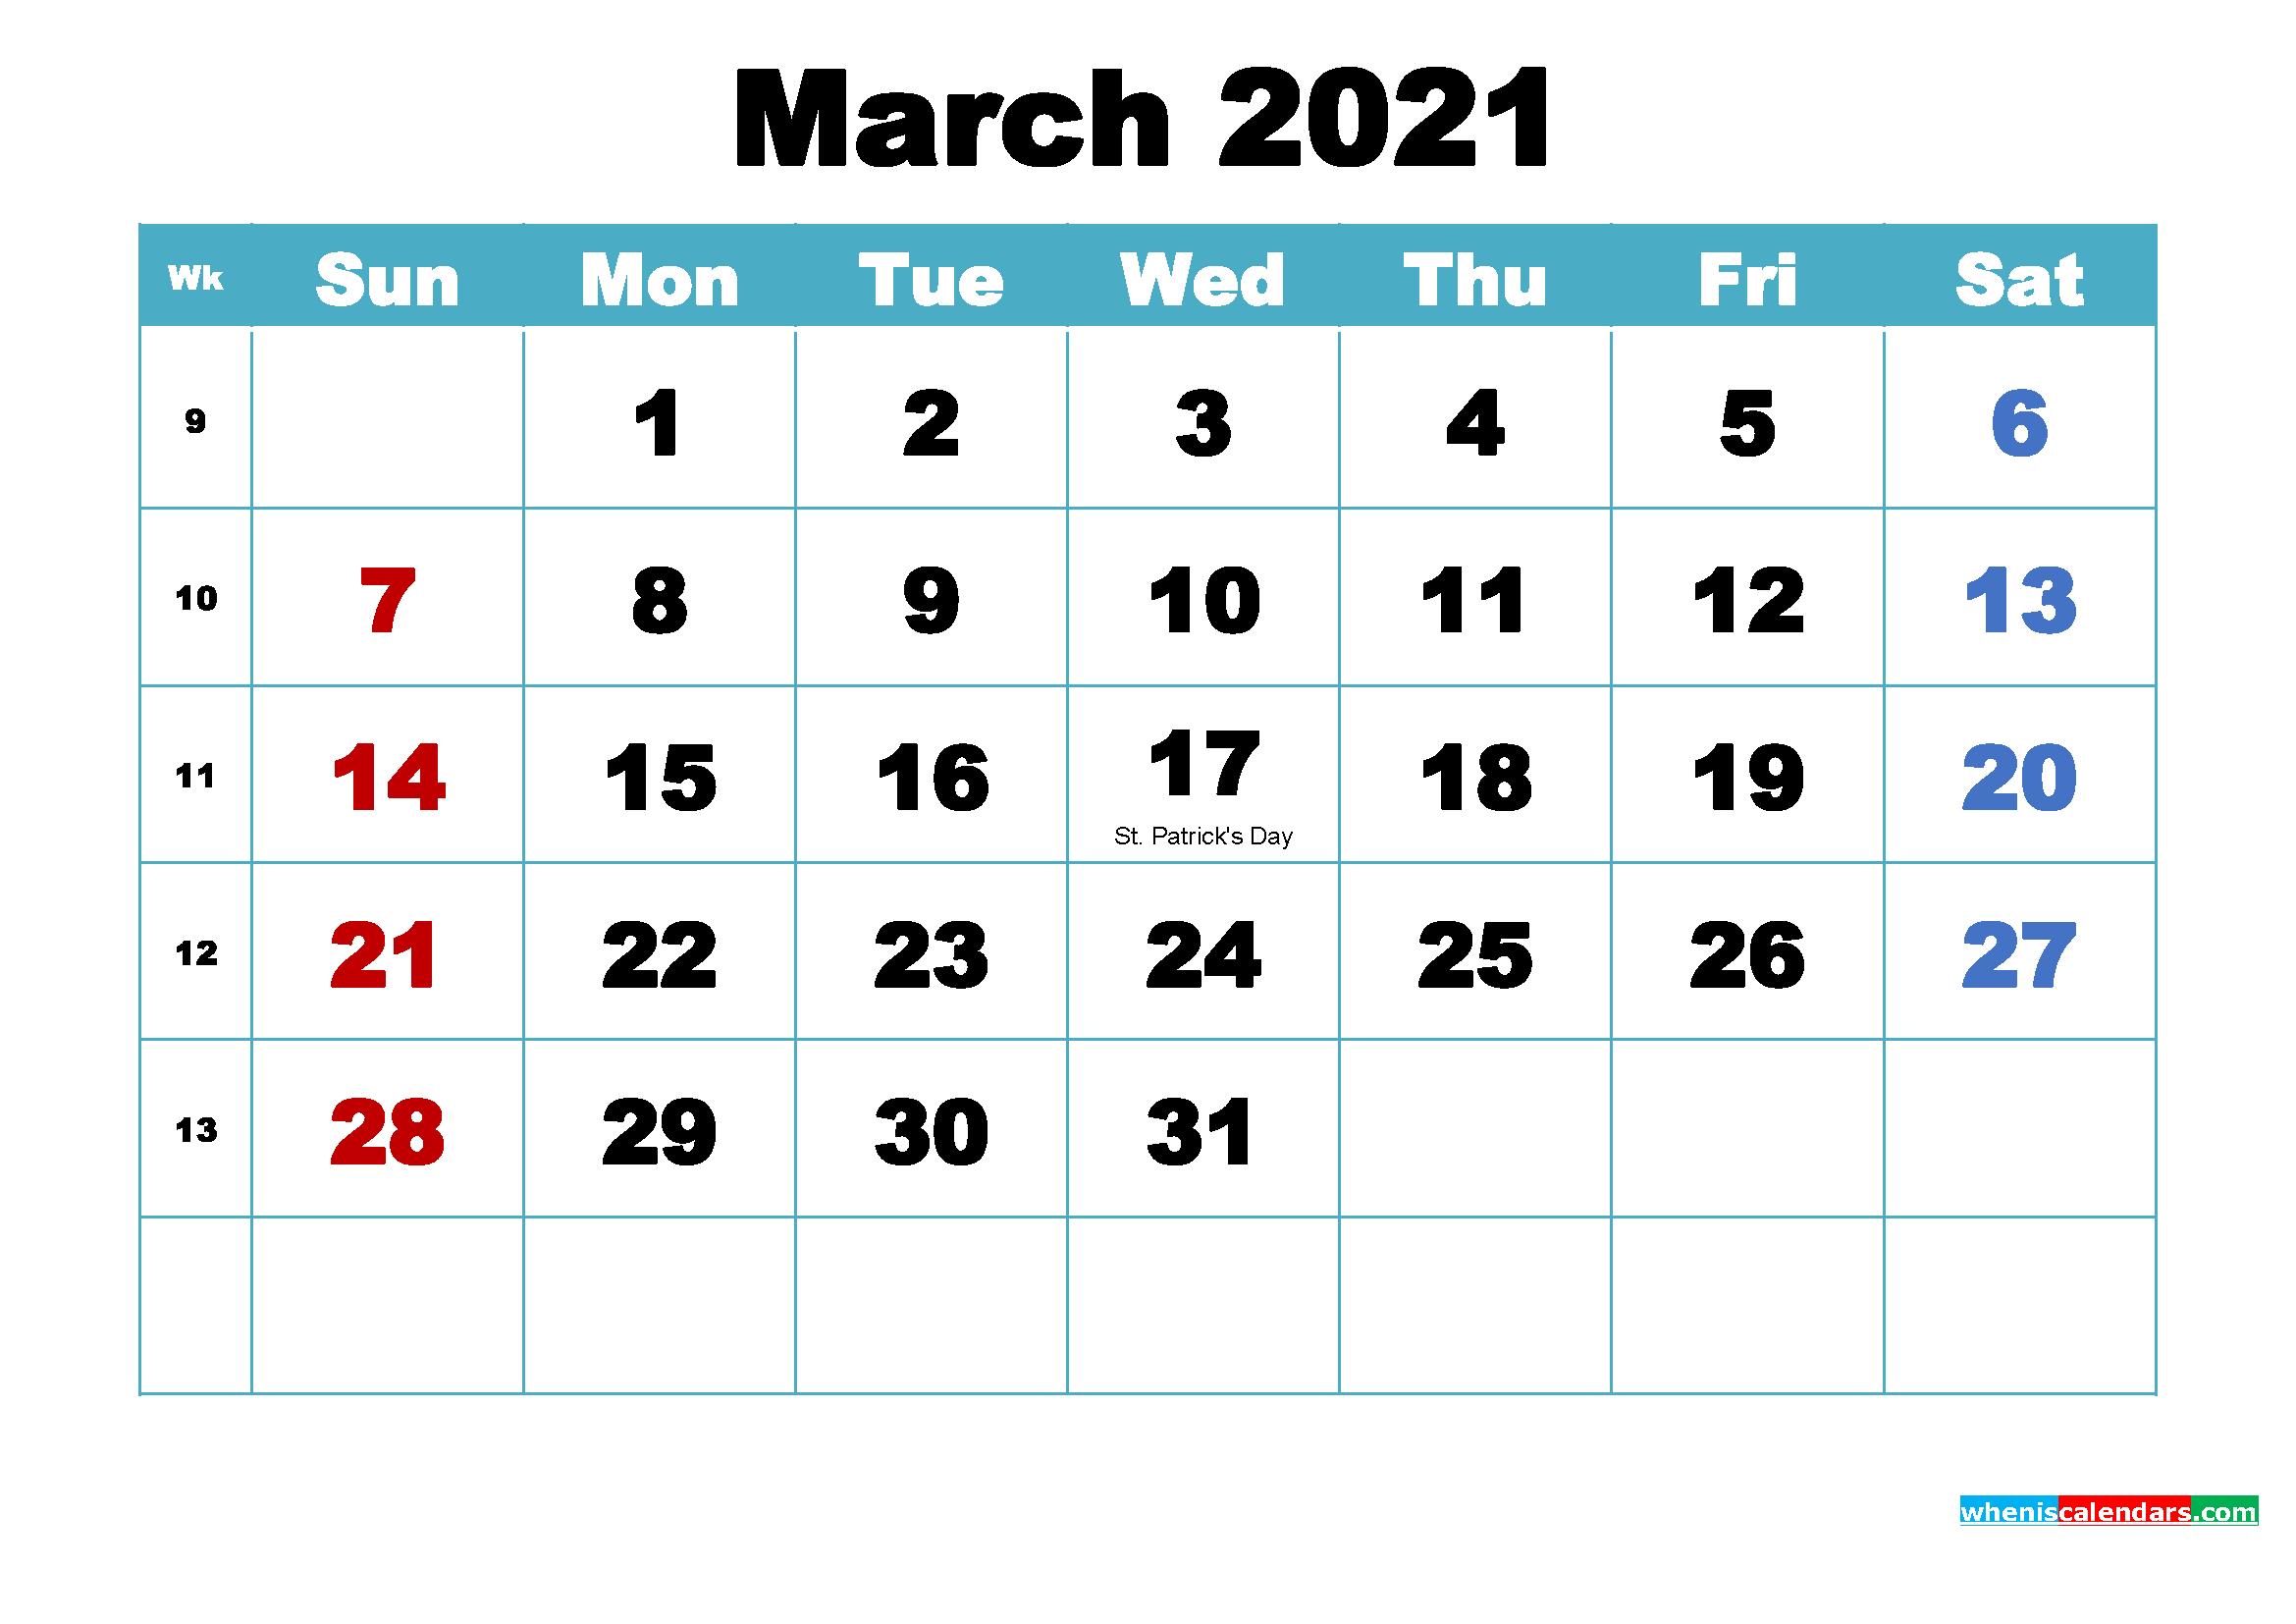 Free Printable 2021 Calendar March As Word, Pdf - Free-2021 Calendar Printable Free Pdf March